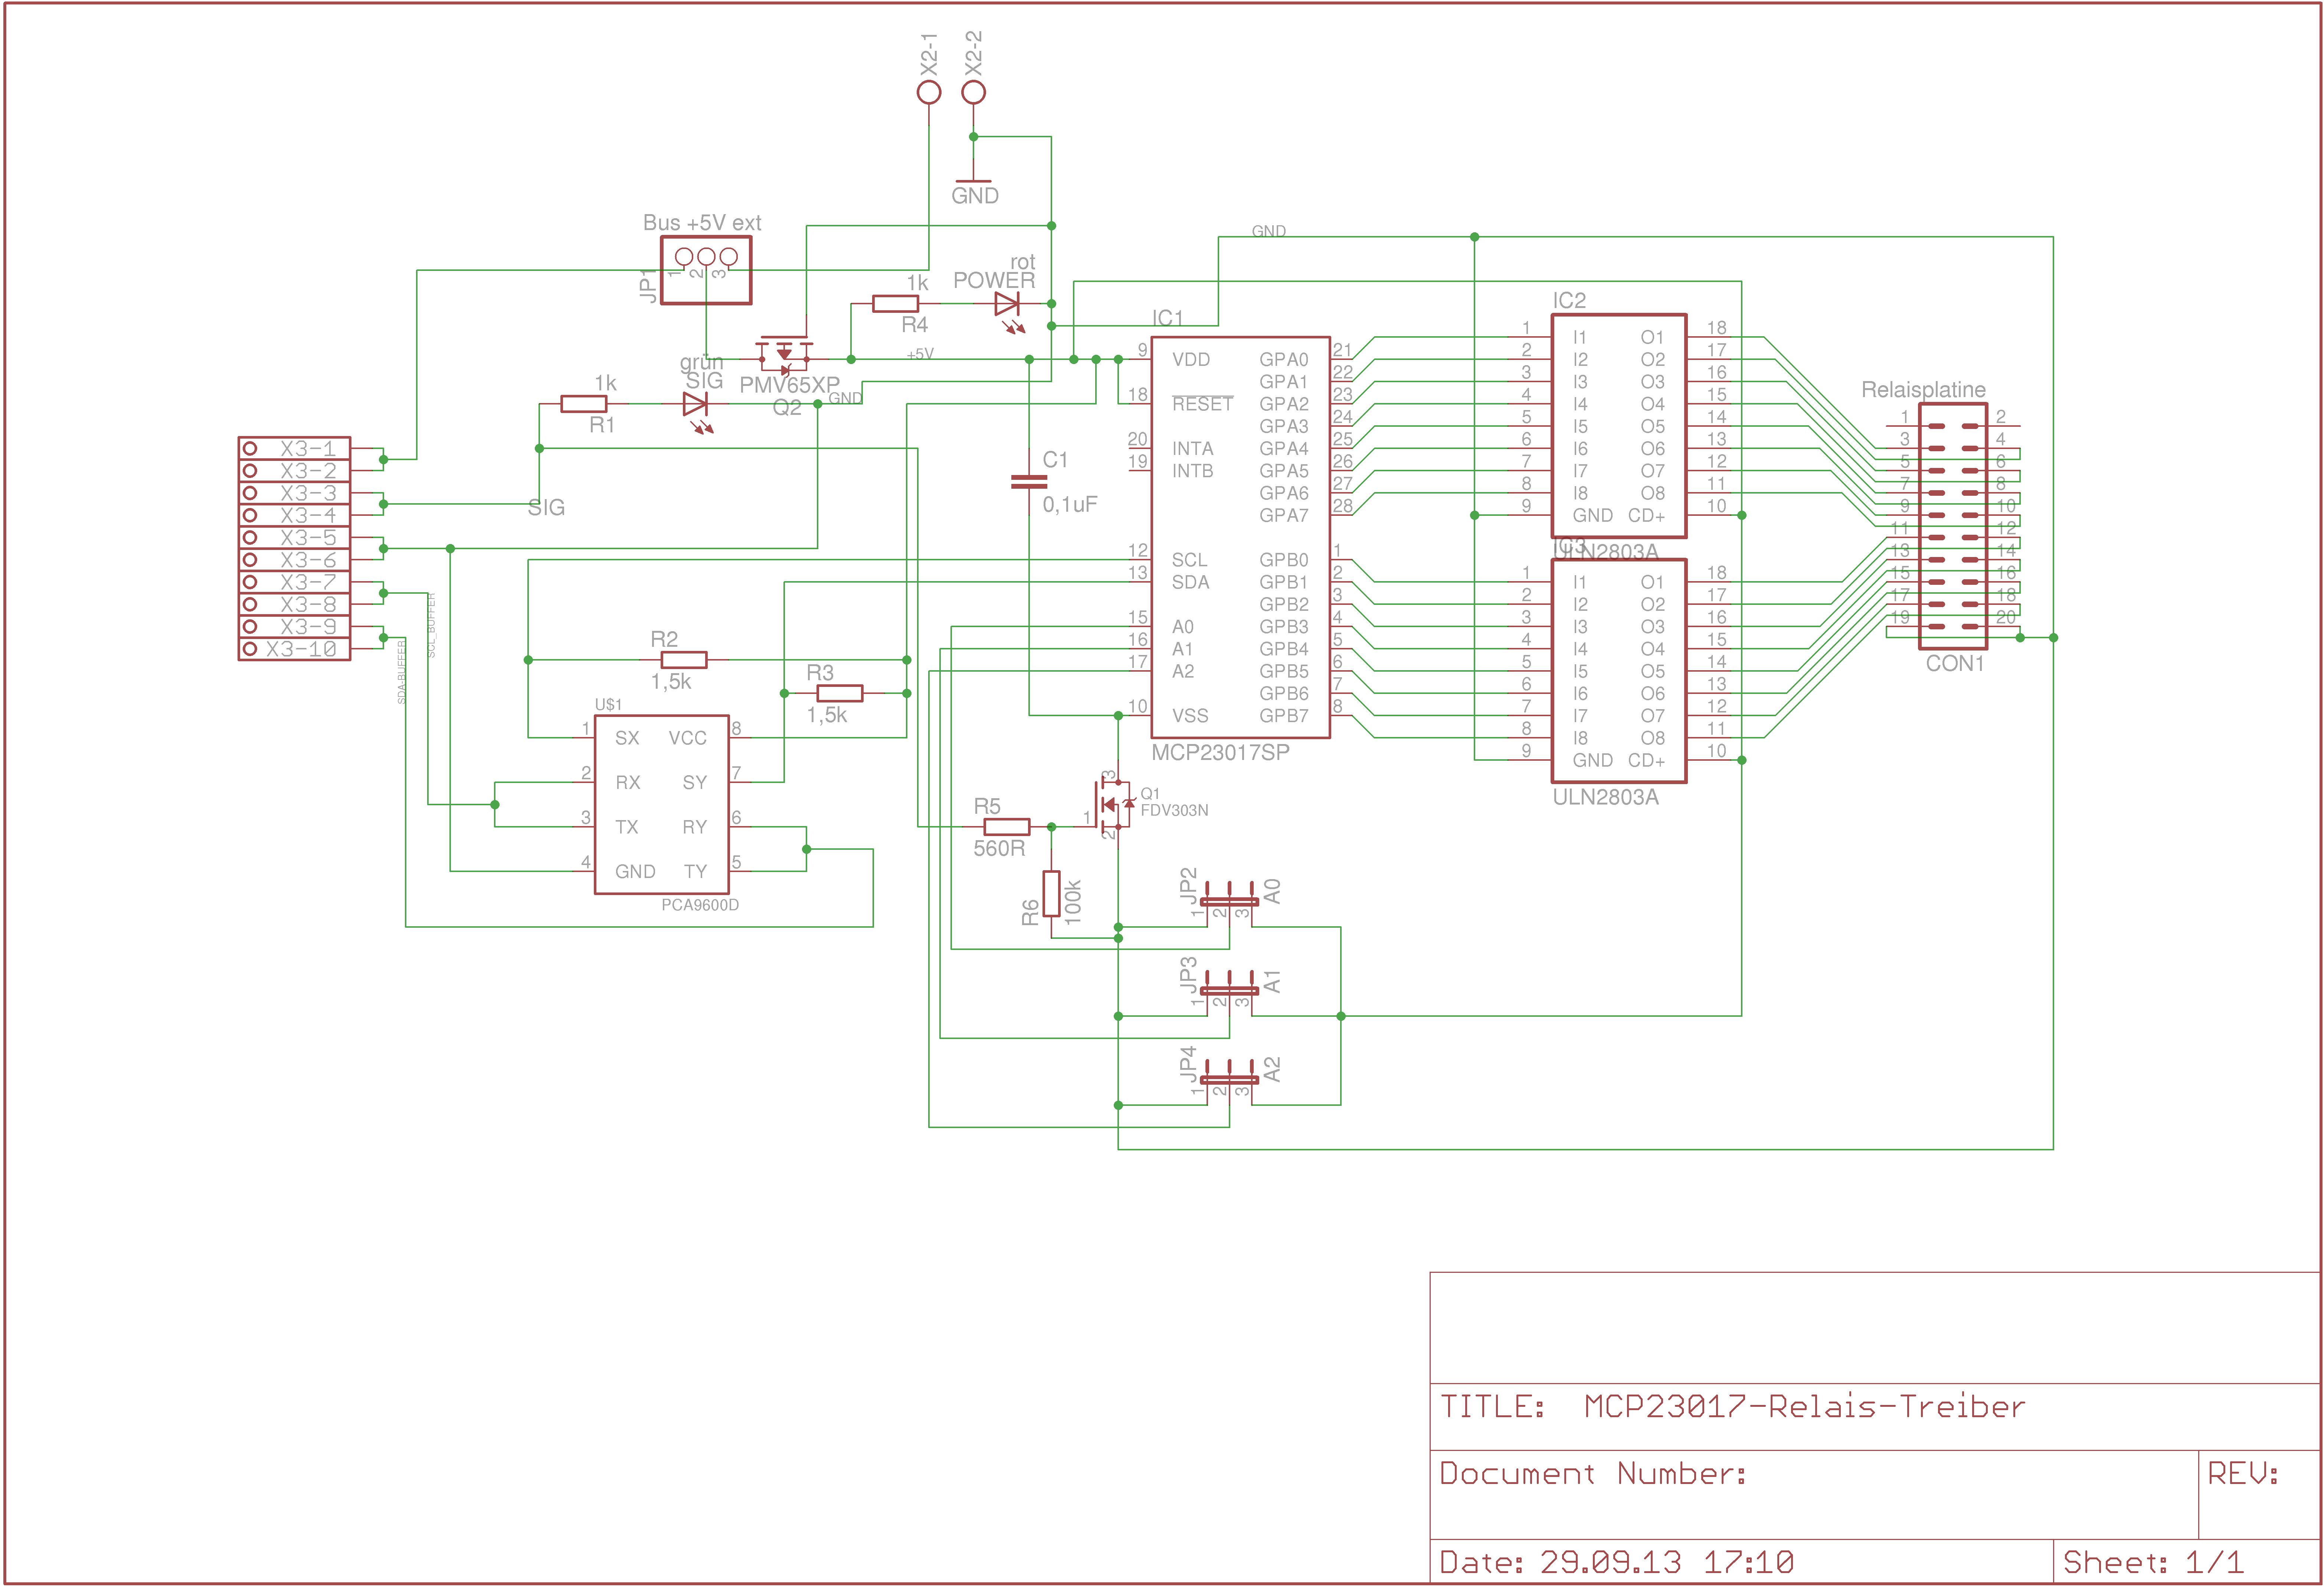 www.mikrocontroller.net/attachment/192512/MCP23017...